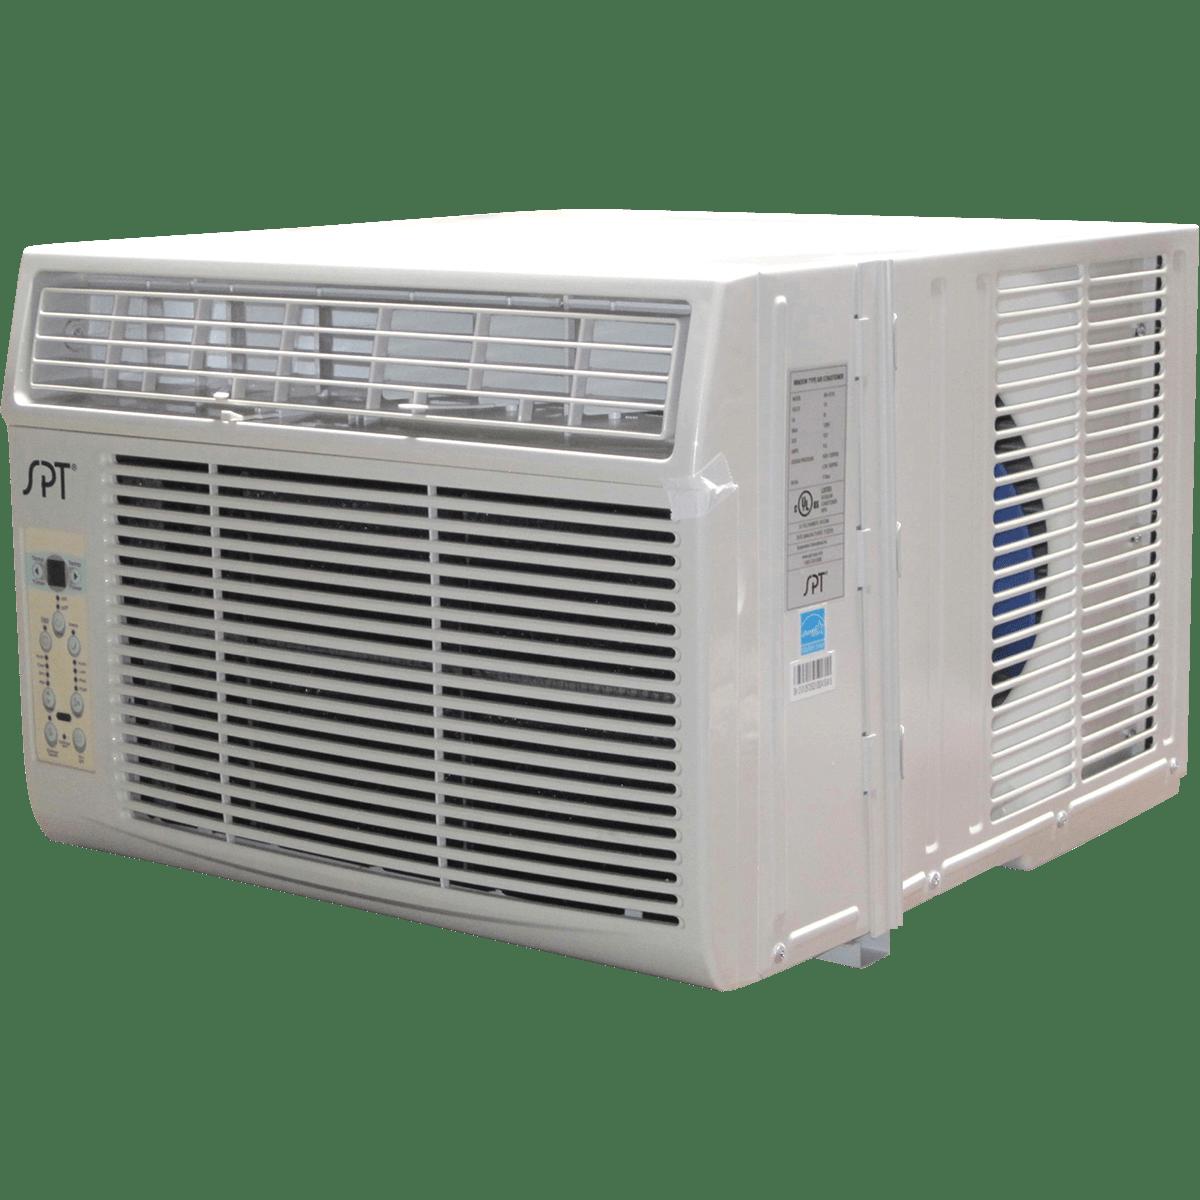 Sunpentown WA-12FMS1 12,000 BTU Window Air Conditioner w| Follow Me Remote